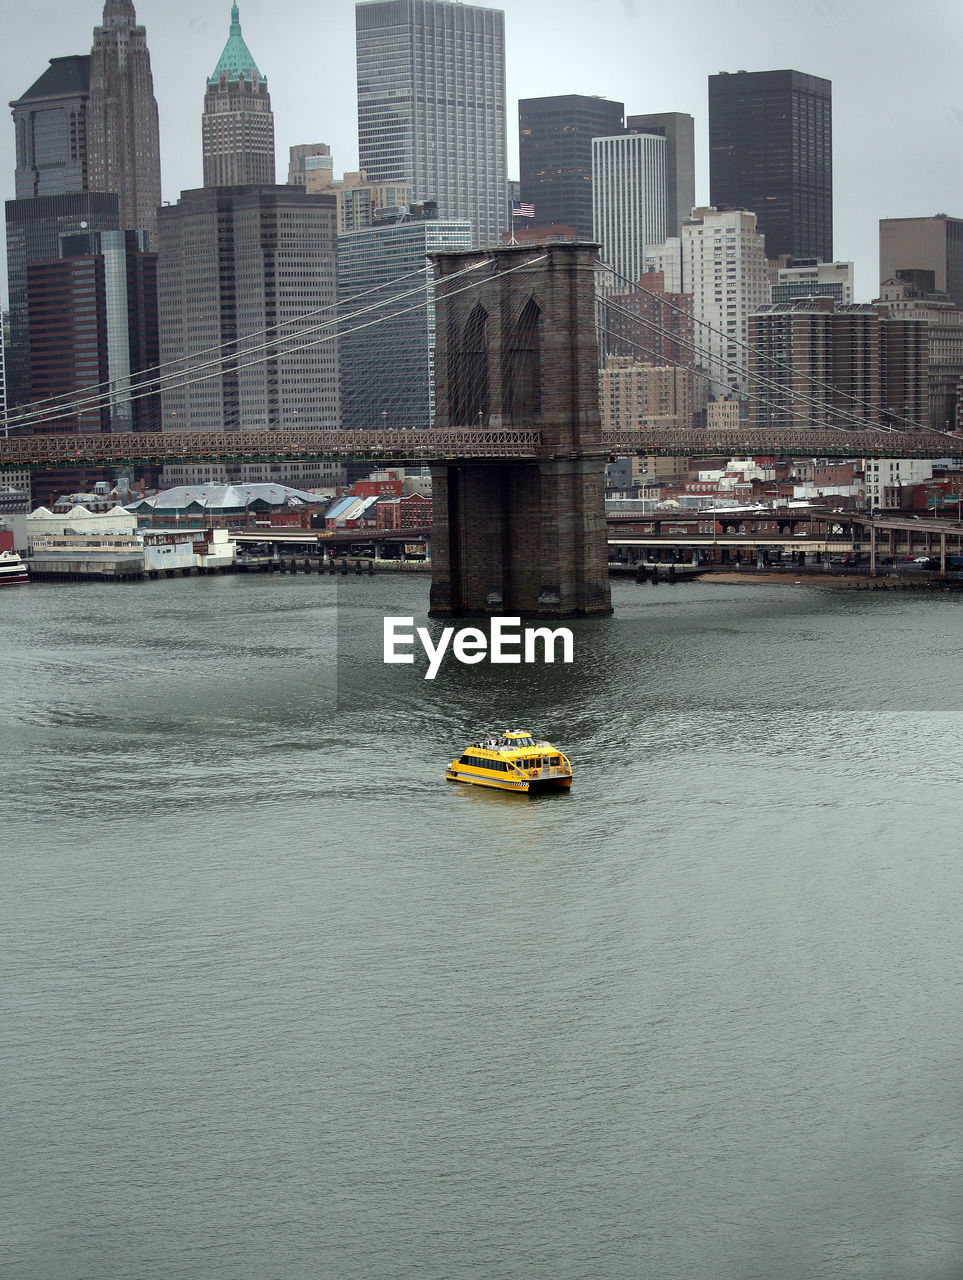 Ferry Sailing In East River By Brooklyn Bridge Against City Skyline